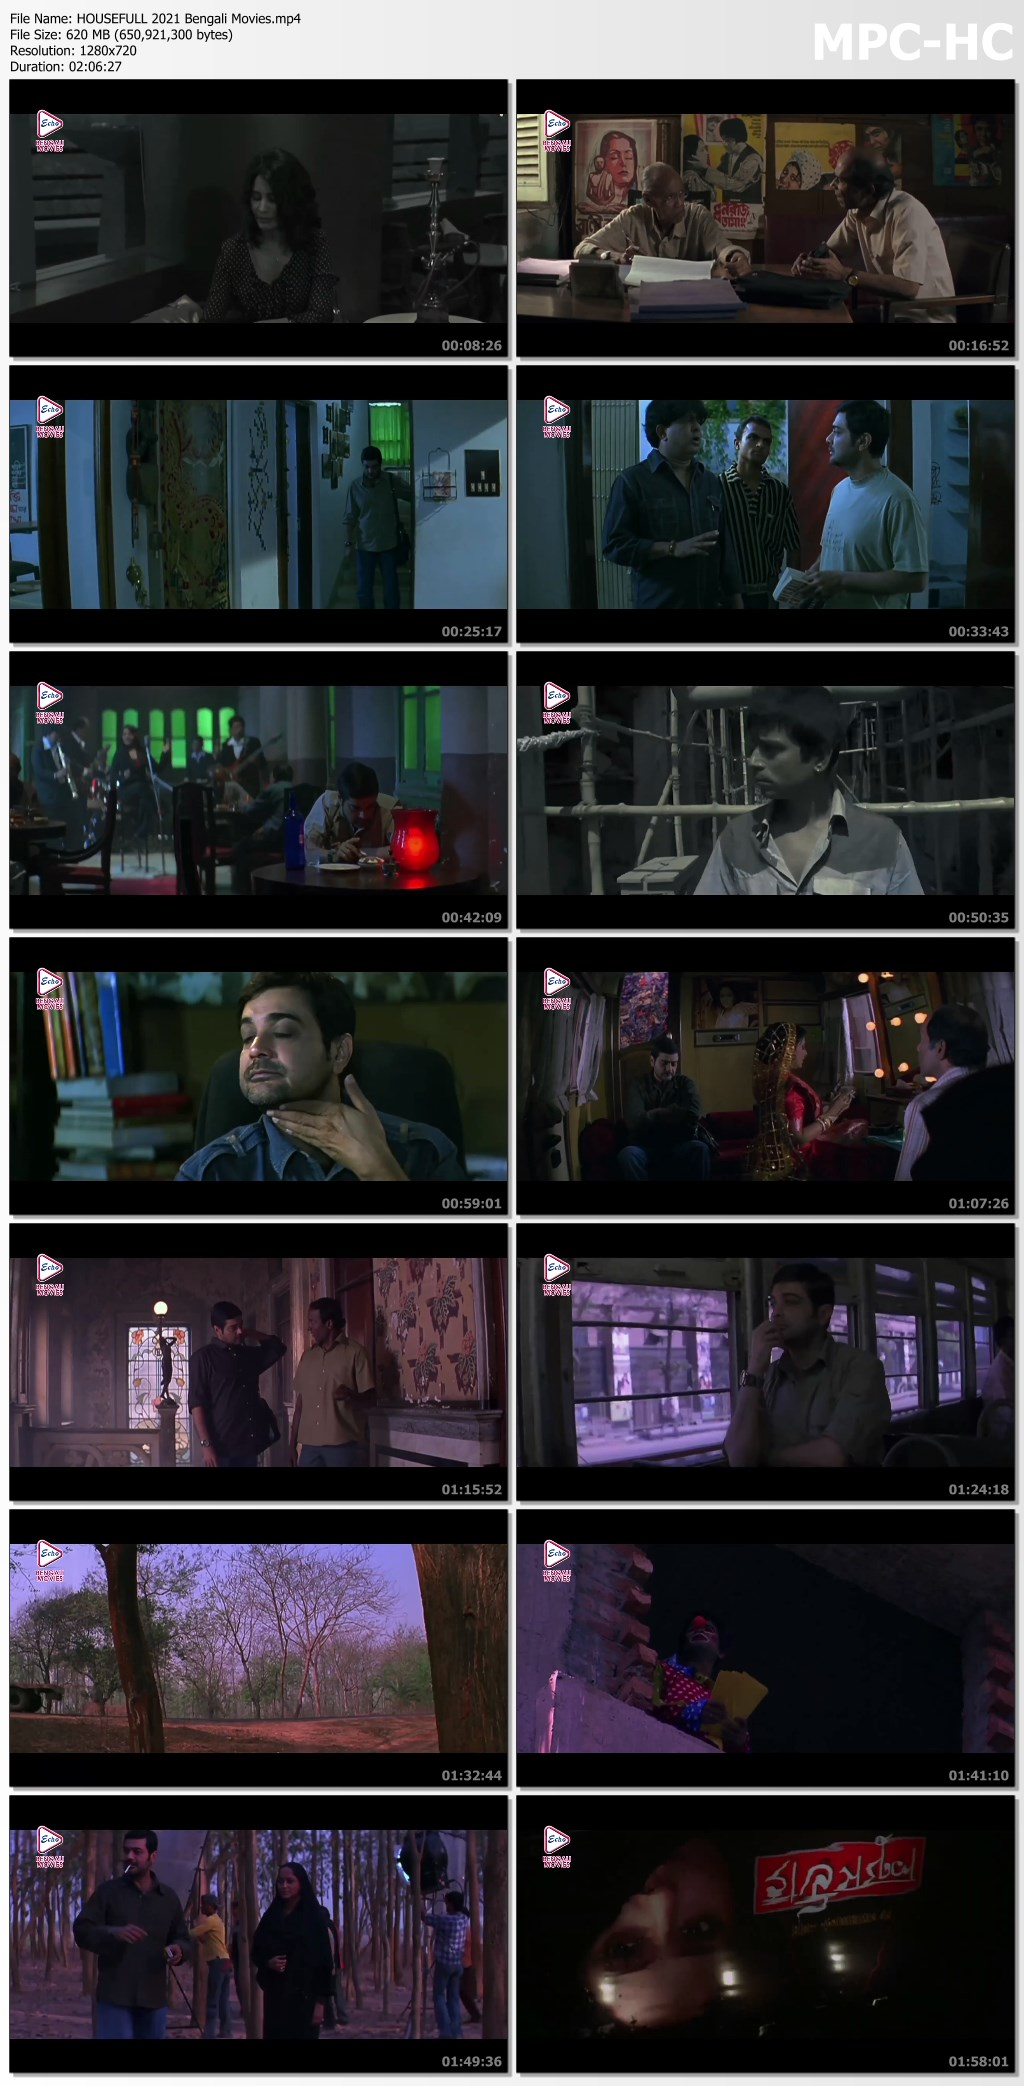 HOUSEFULL 2021 Bengali Movies.mp4 thumbs